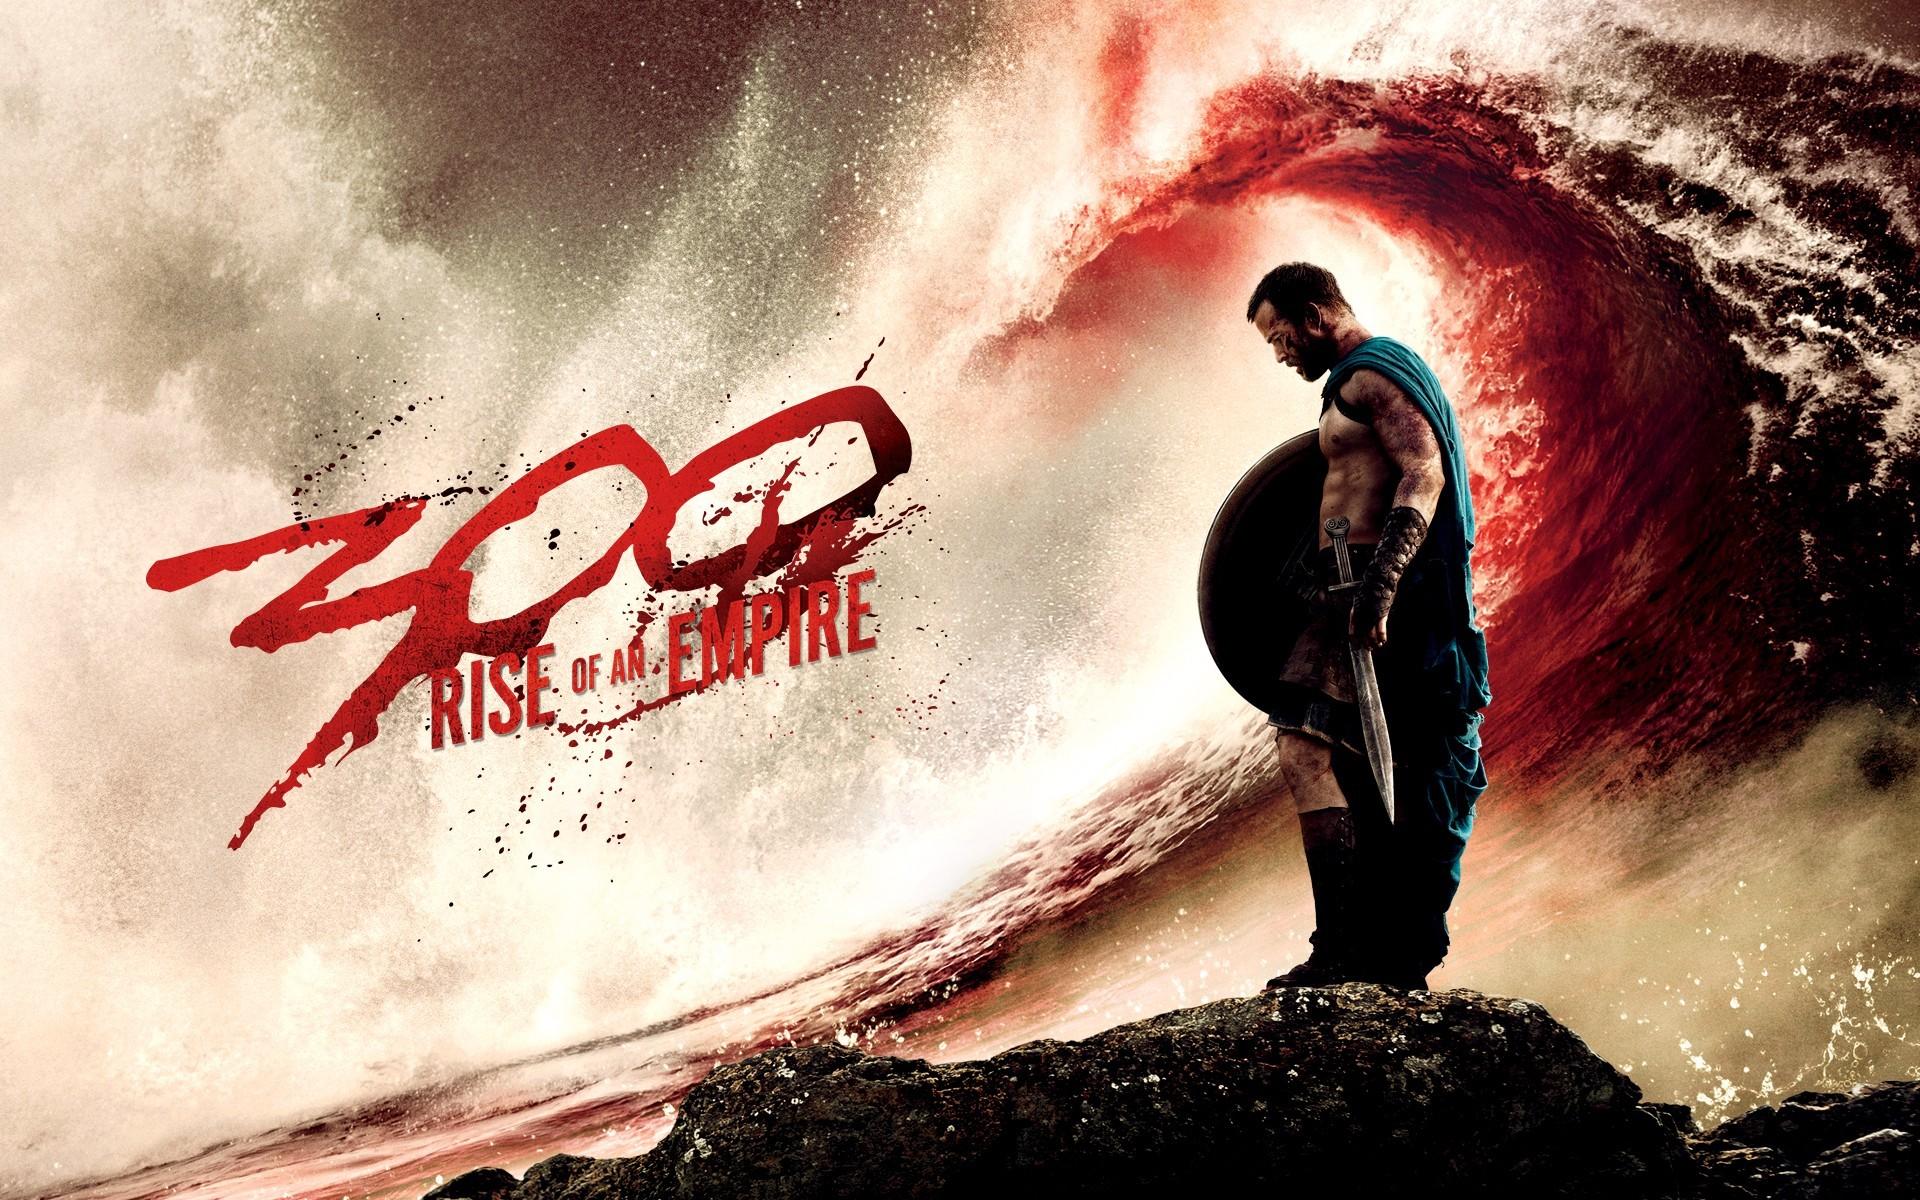 … 300 rise of an empire wave sword spartan wallpaper …